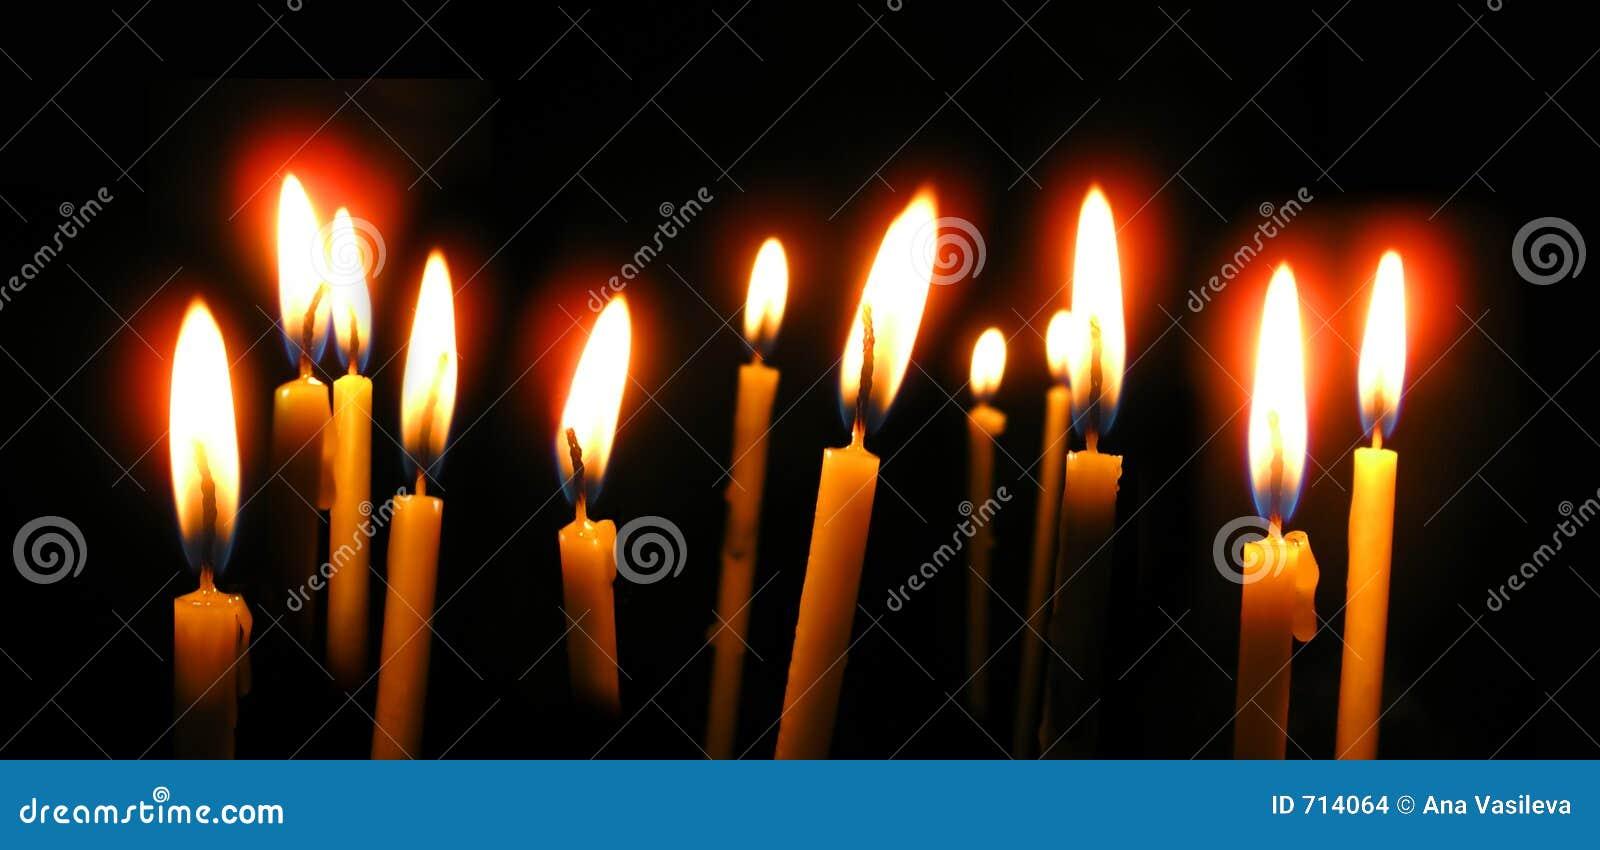 Orthodox Church Wax Candles